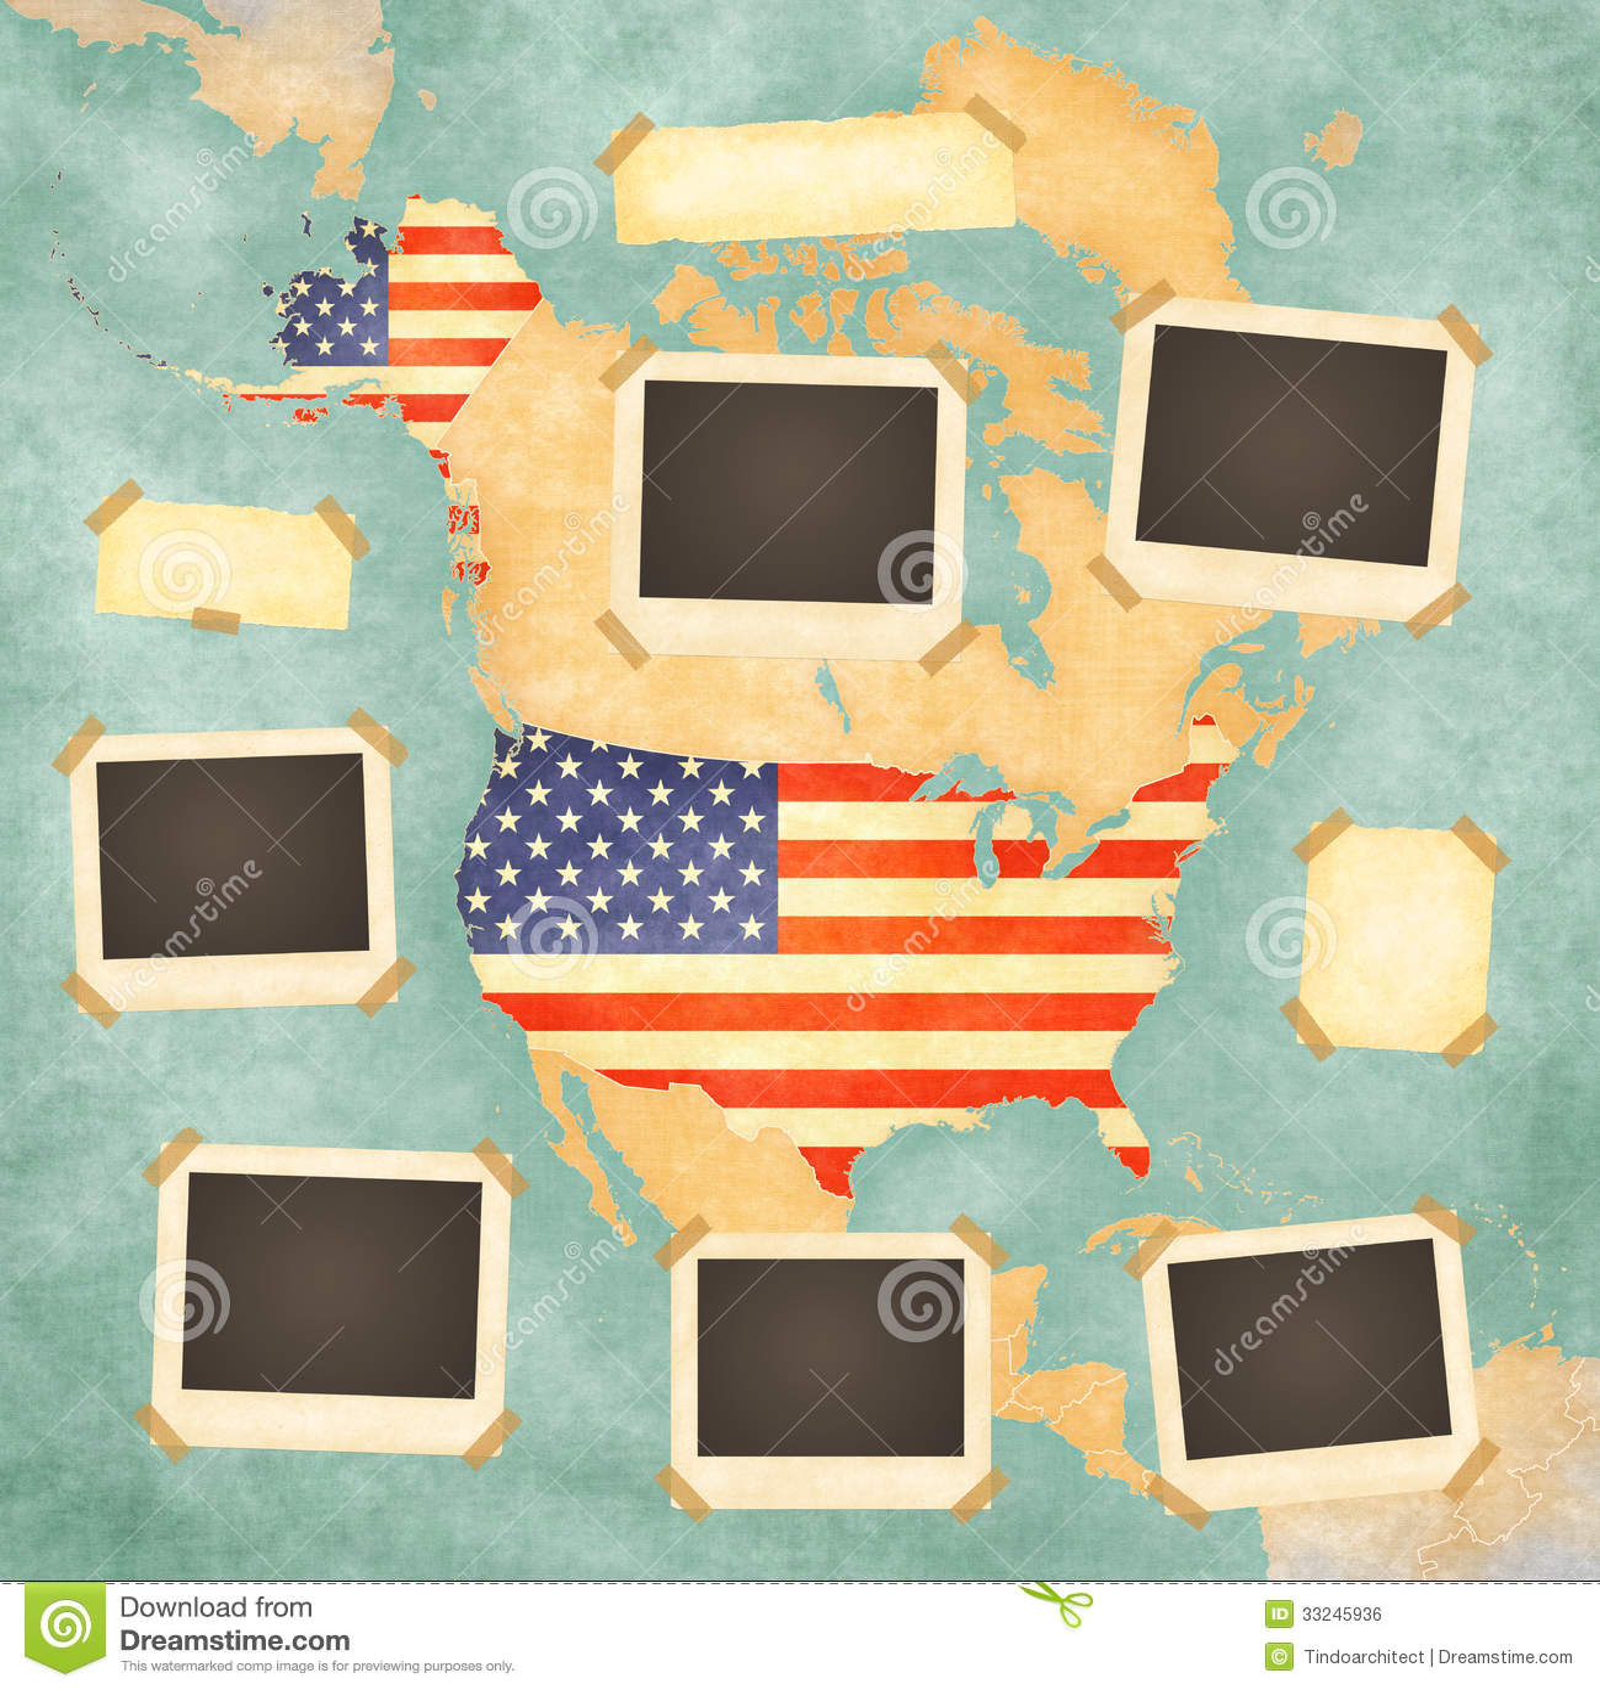 Vintage Photo Frames USA Royalty Free Stock Image Image - Free united states map graphic